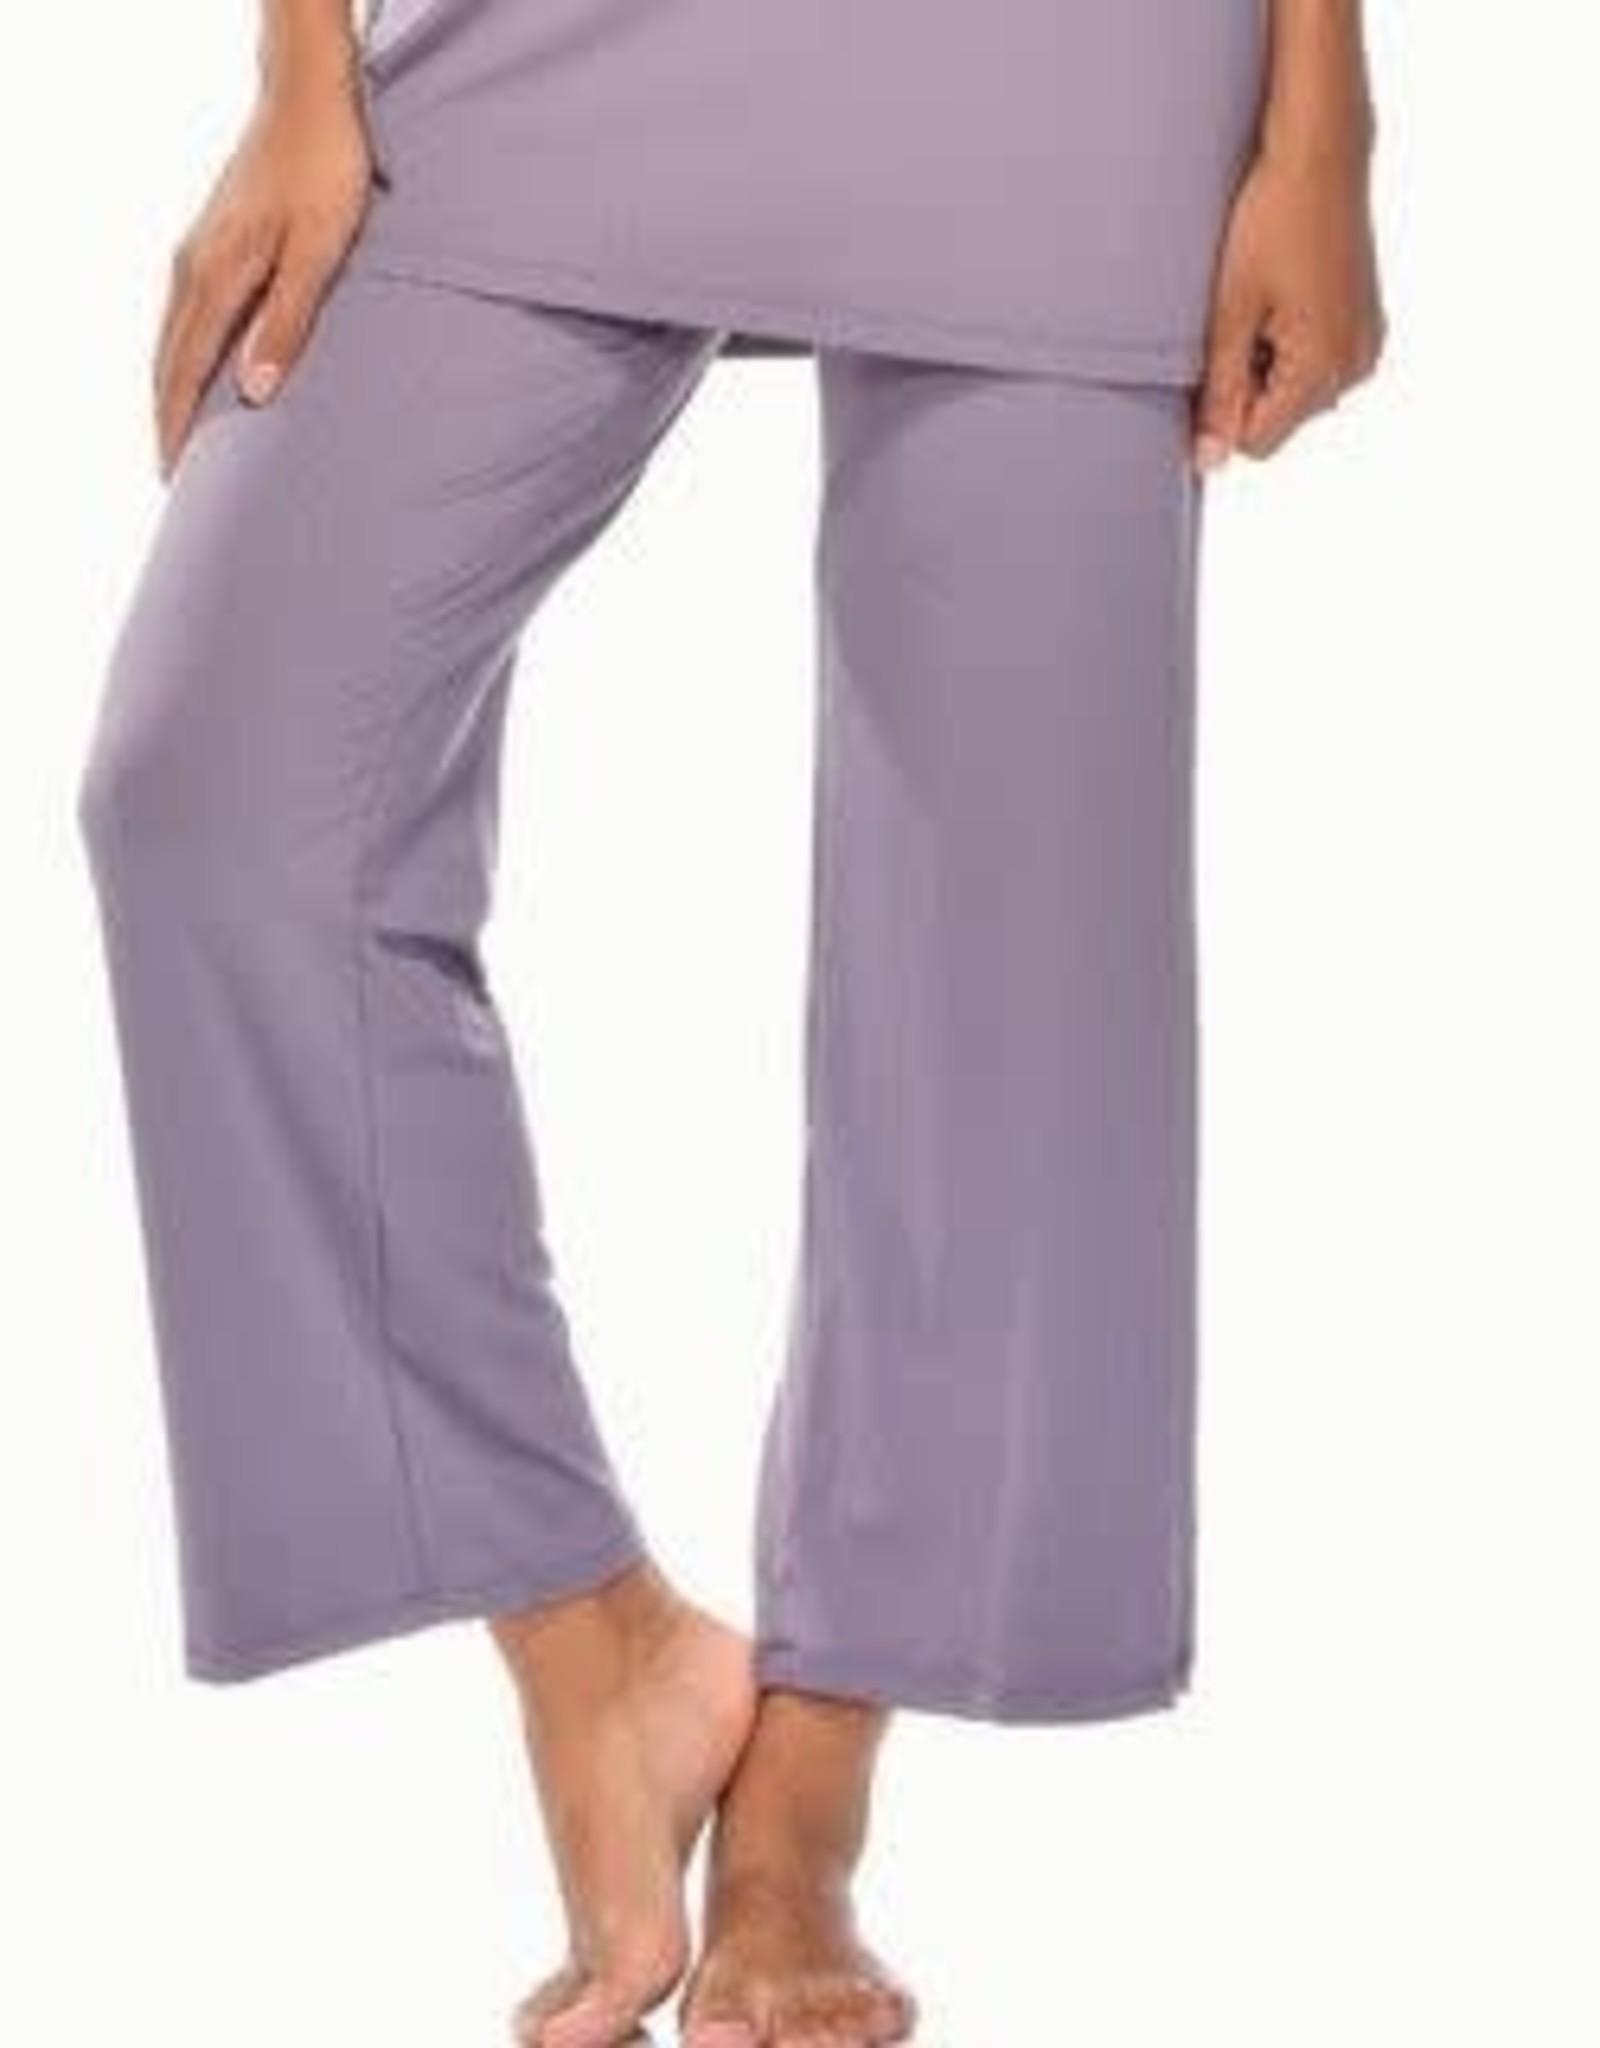 Rapz Rapz bamboo relaxed fit pants